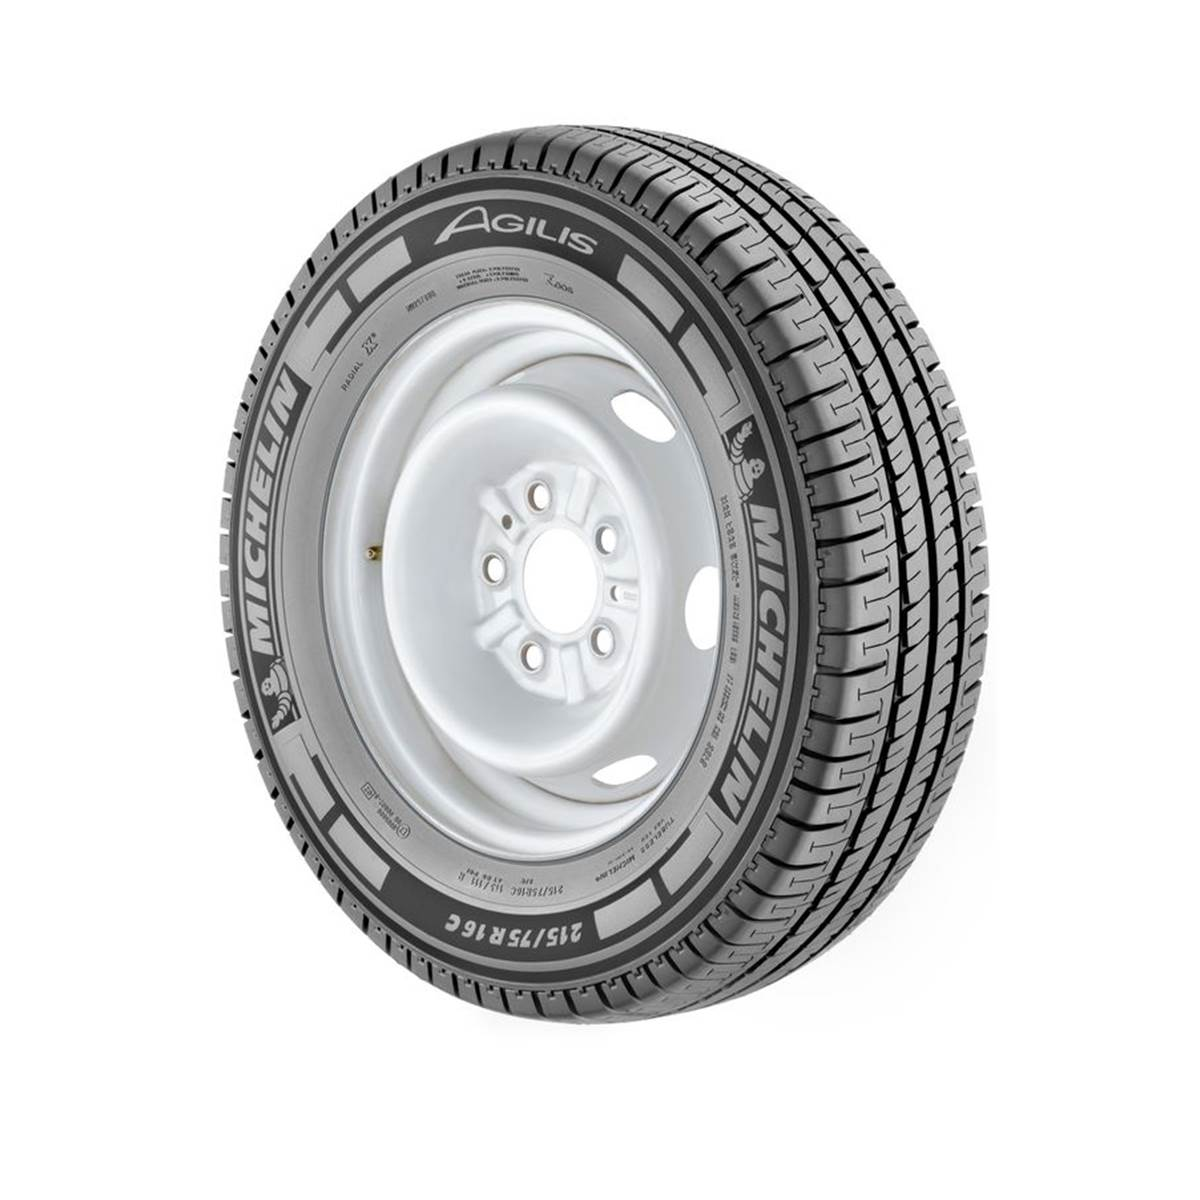 Michelin Agilis Camping pneu